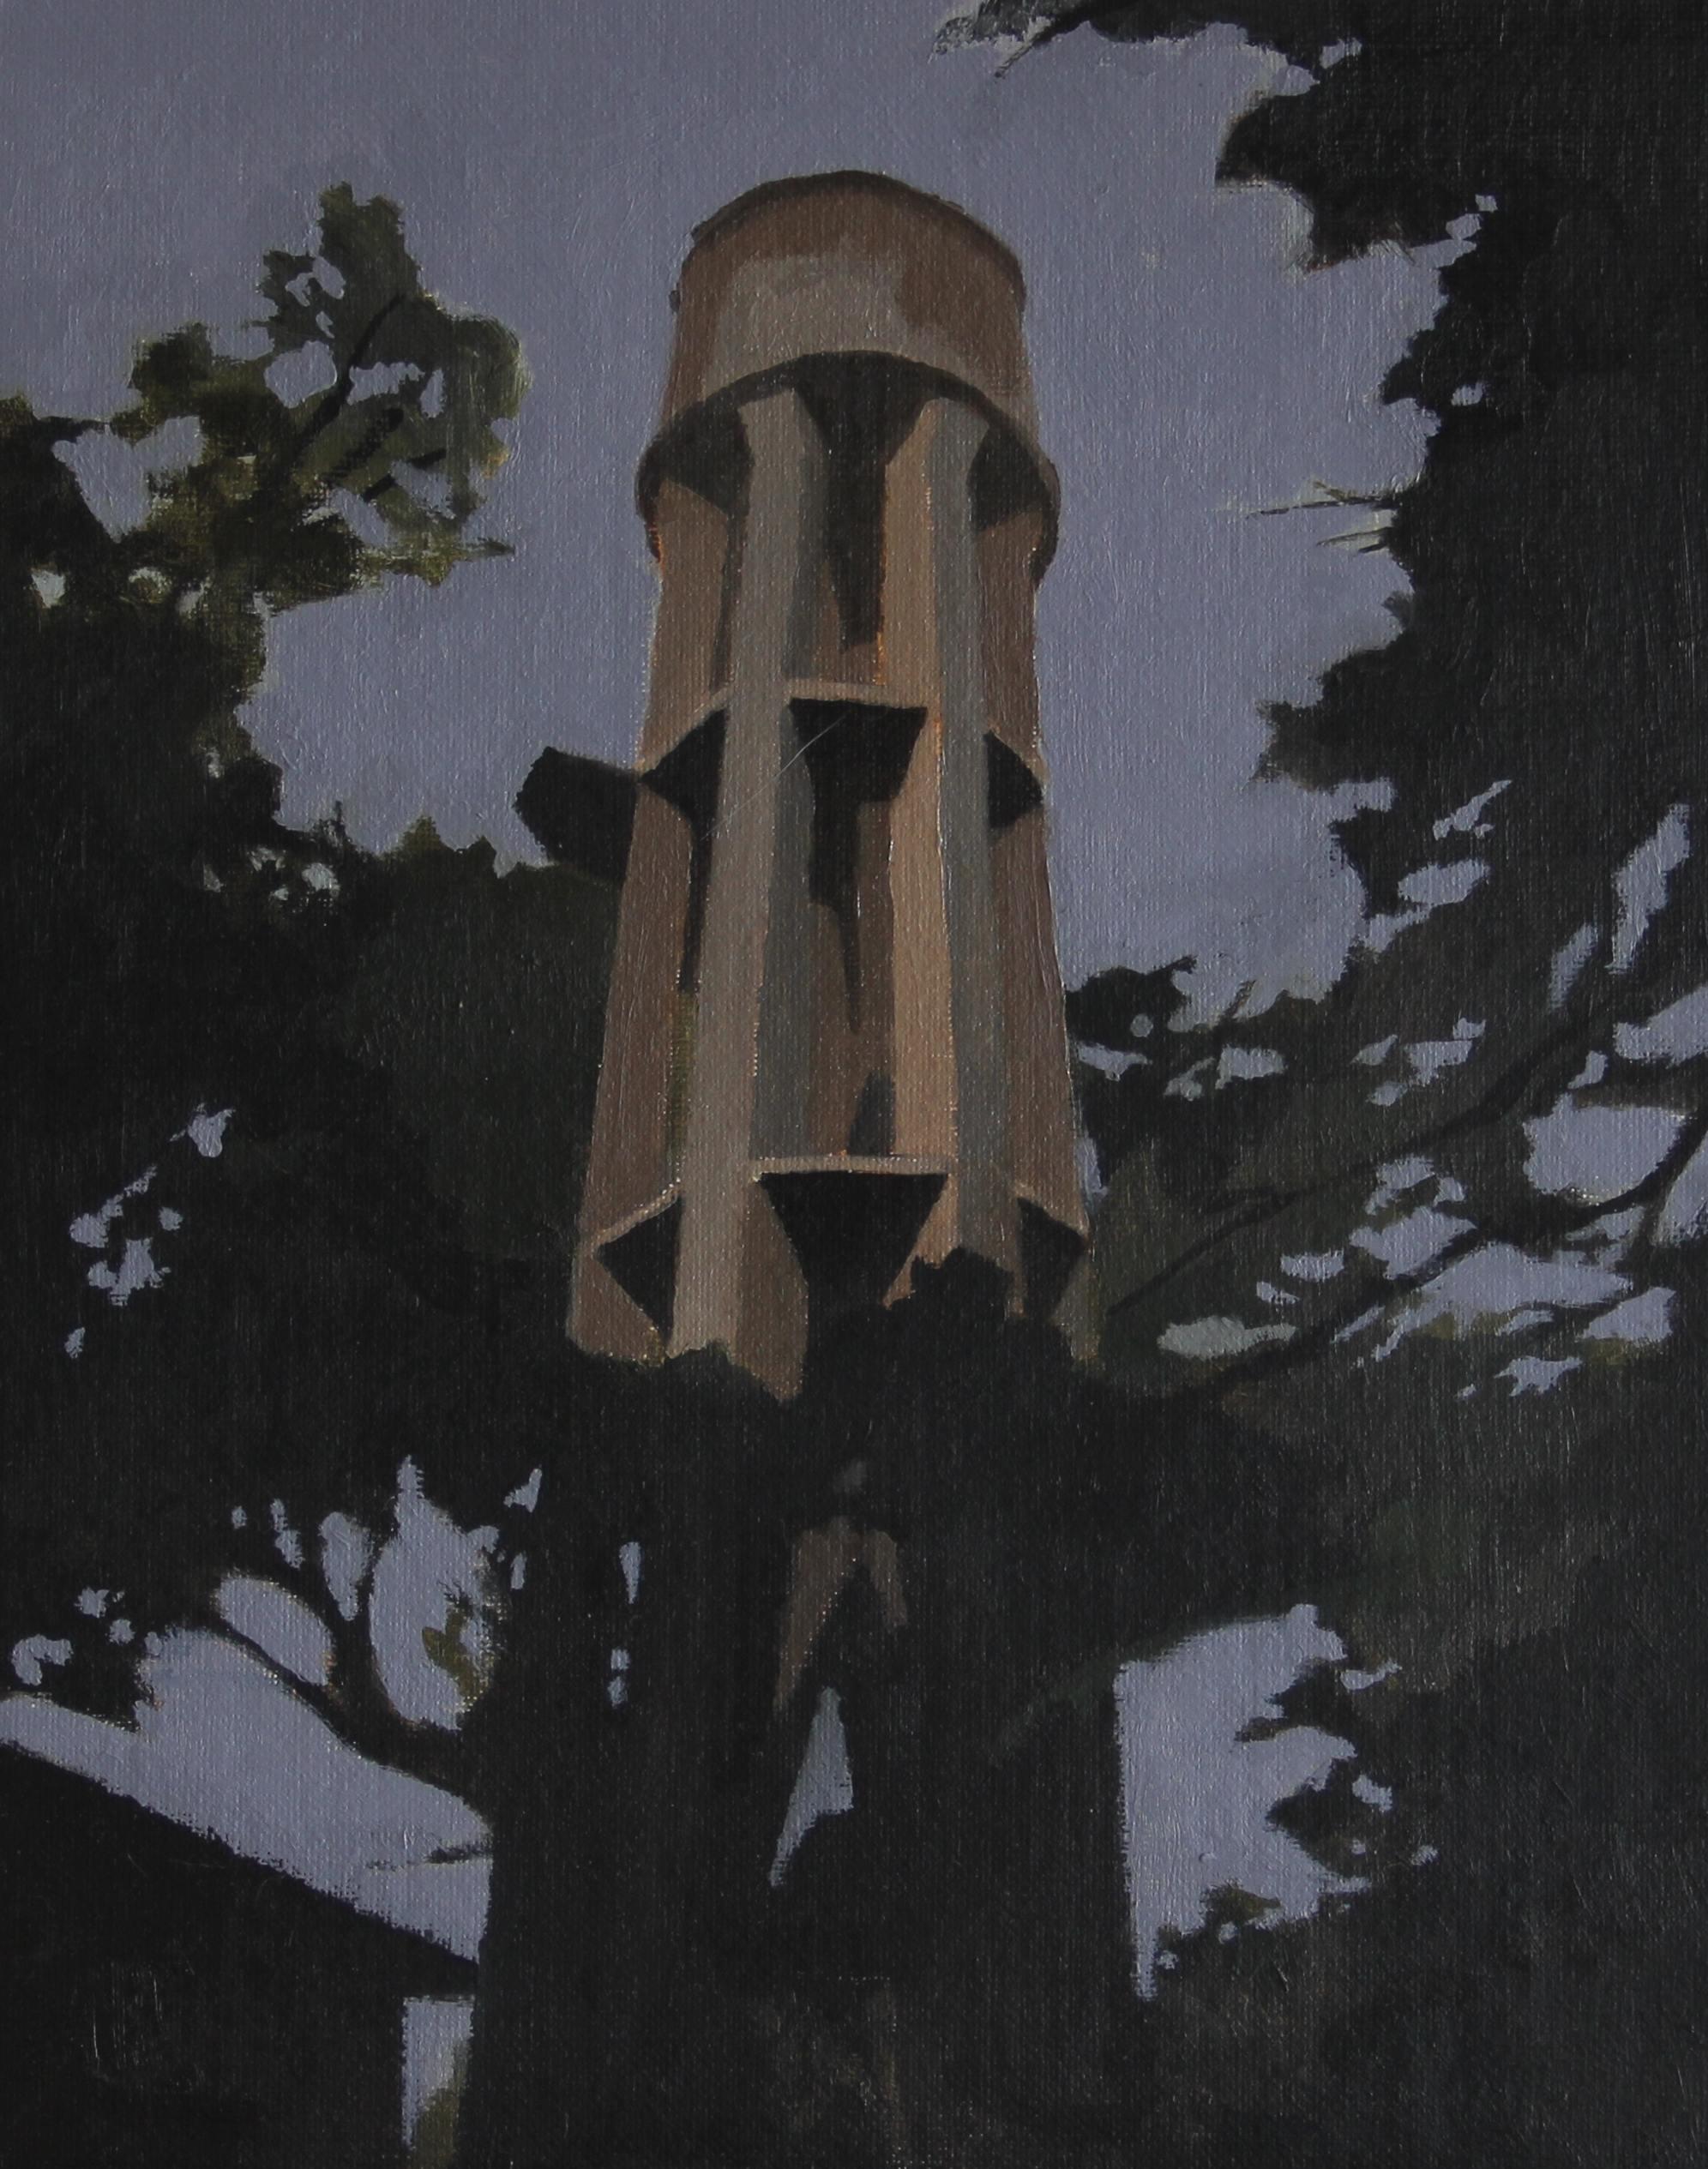 Water tower 2   2011 , 24cm  x 30cm, Oil on canvas.jpg